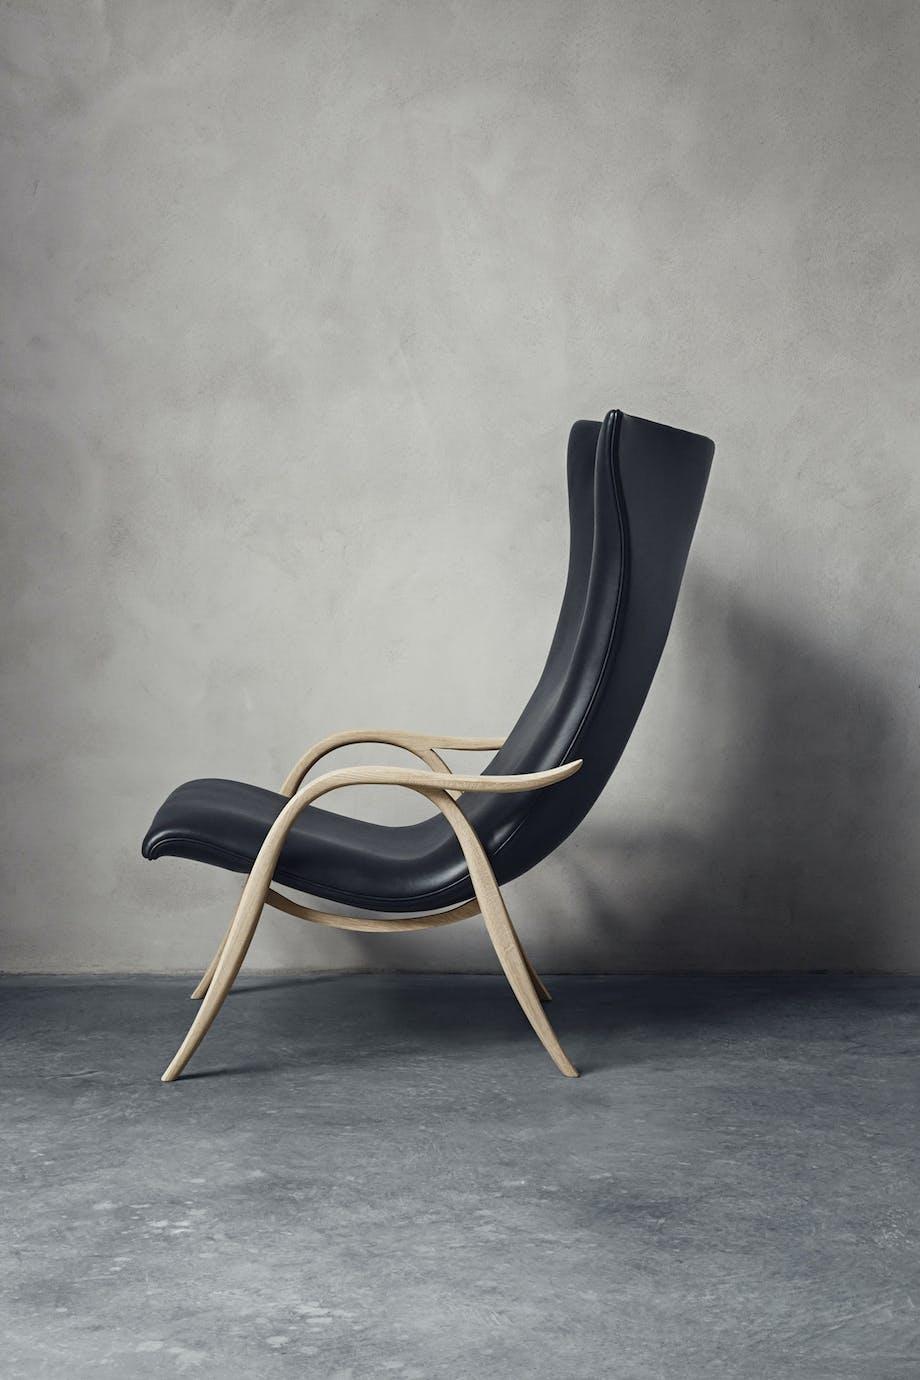 Fritz Henningsens Signature Chair